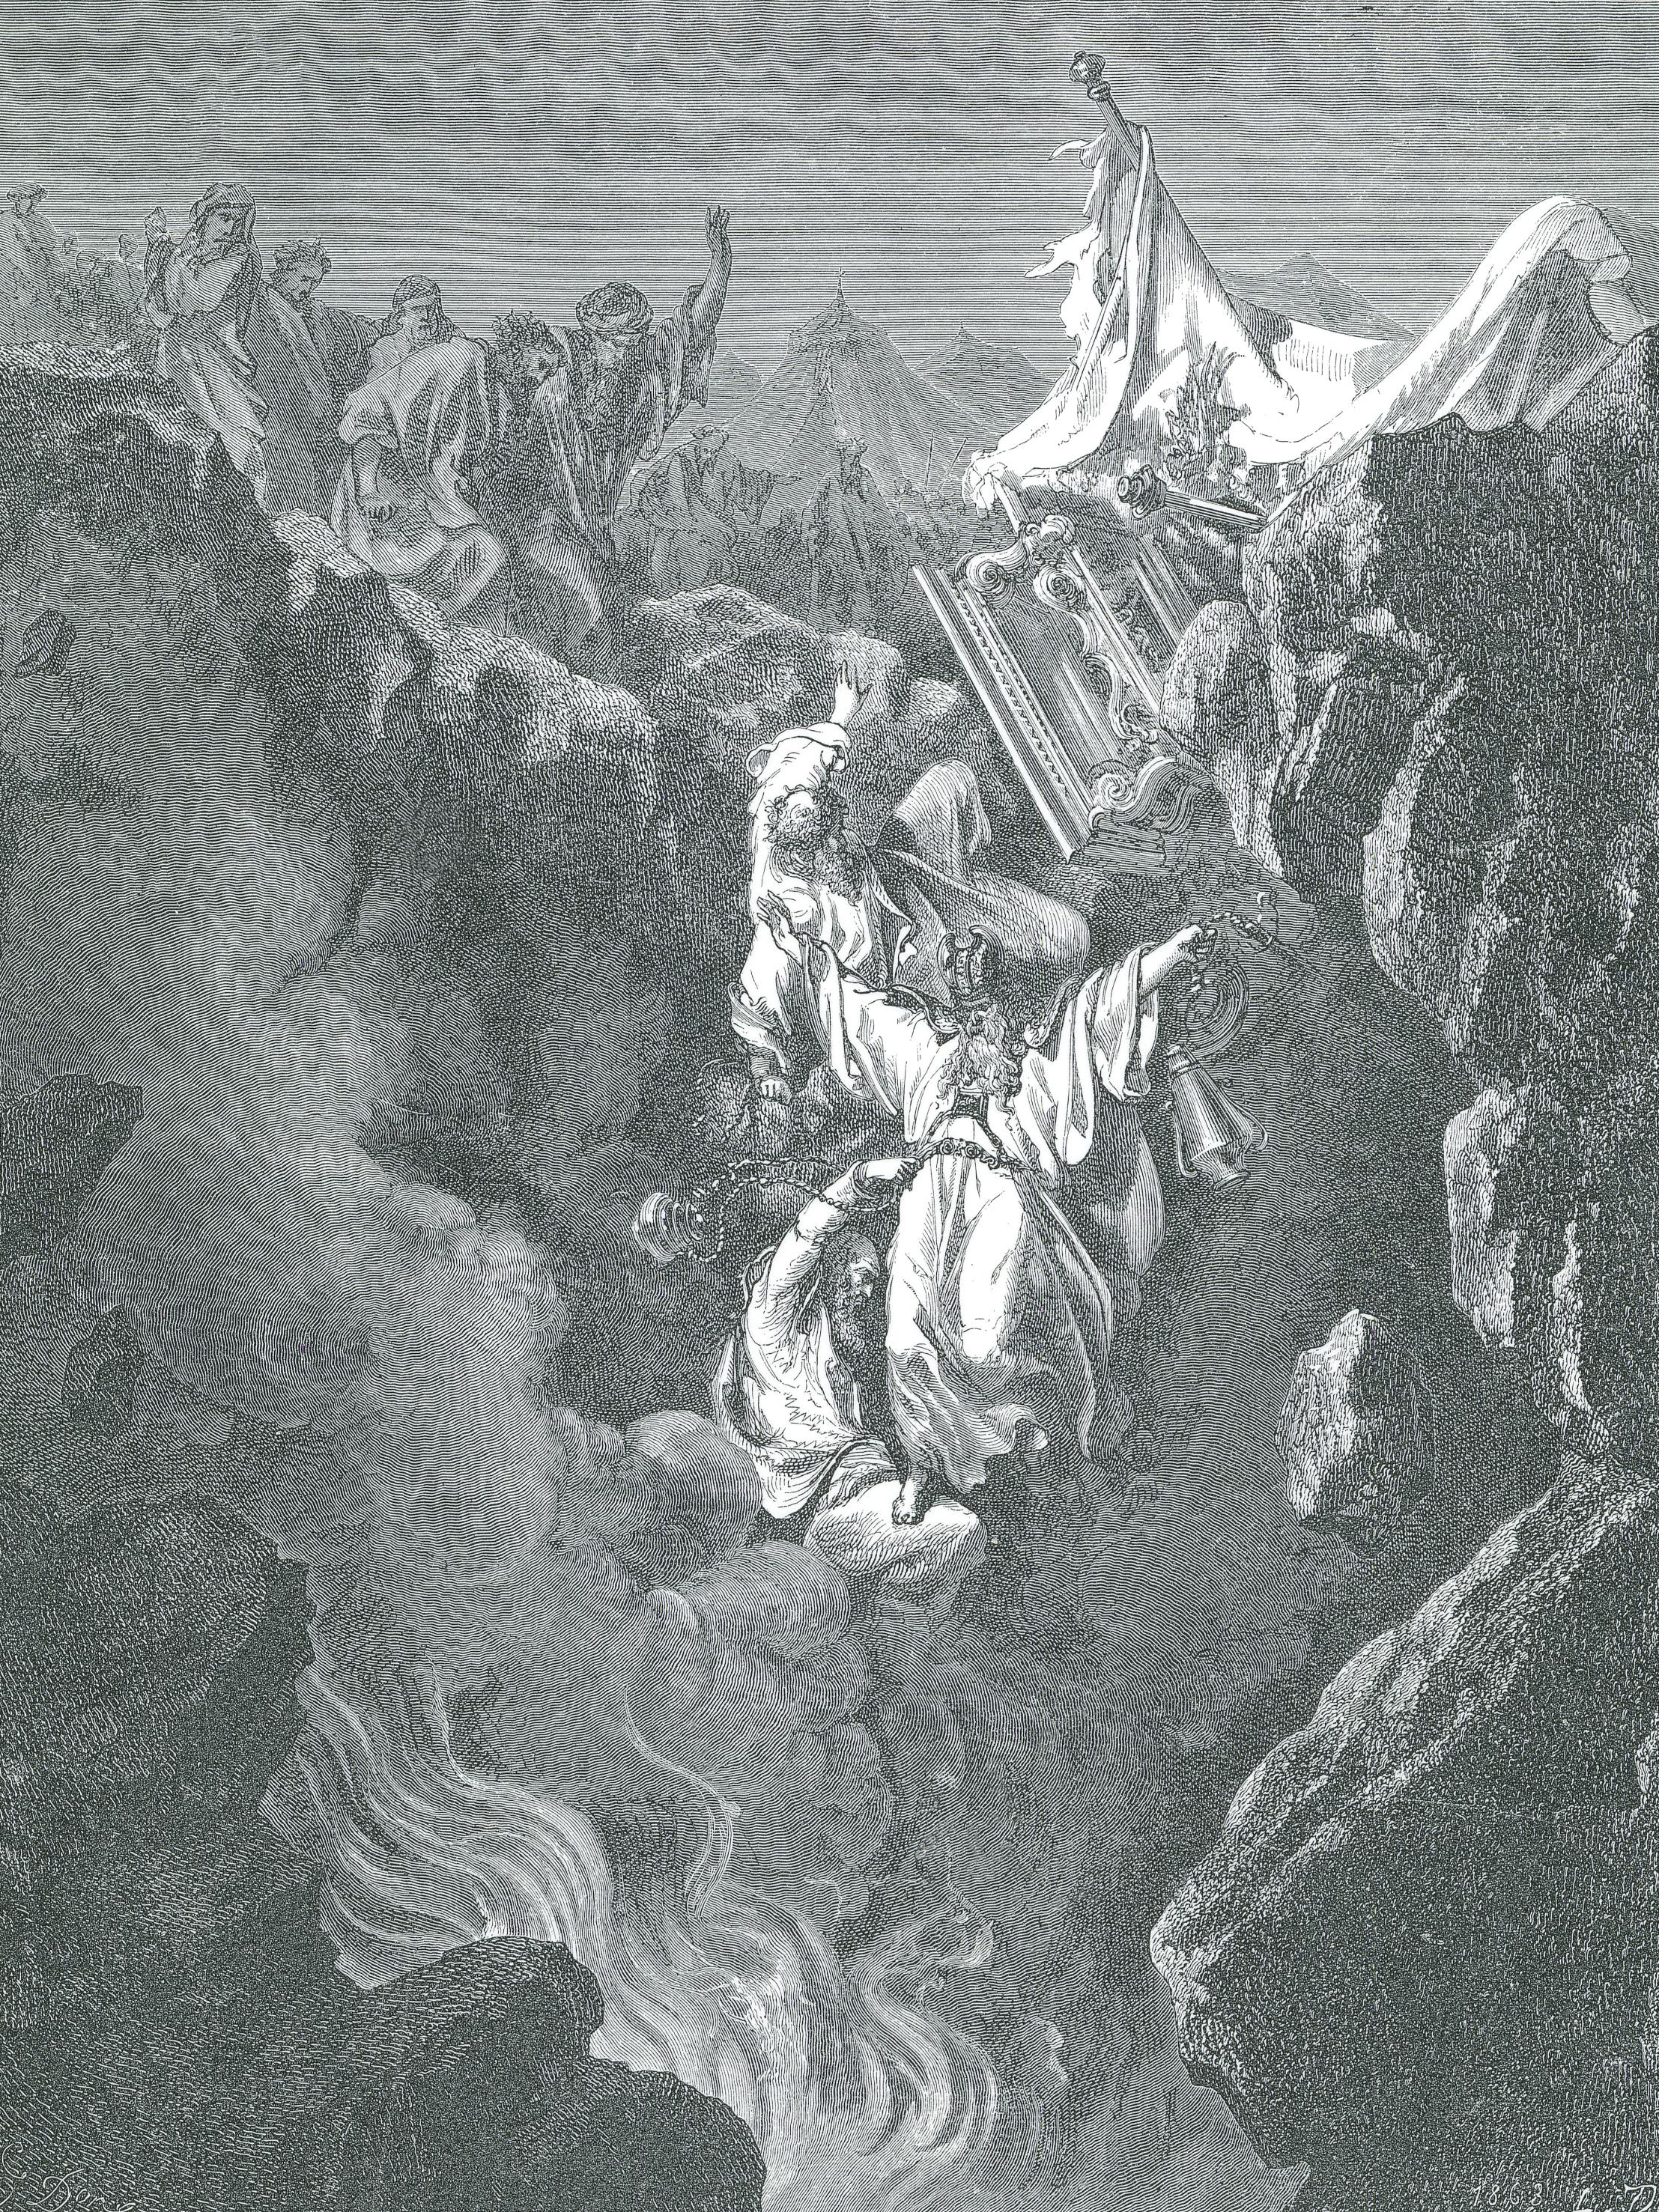 Death of Korah, Dathan, and Abiram, by Paul Gustave Doré